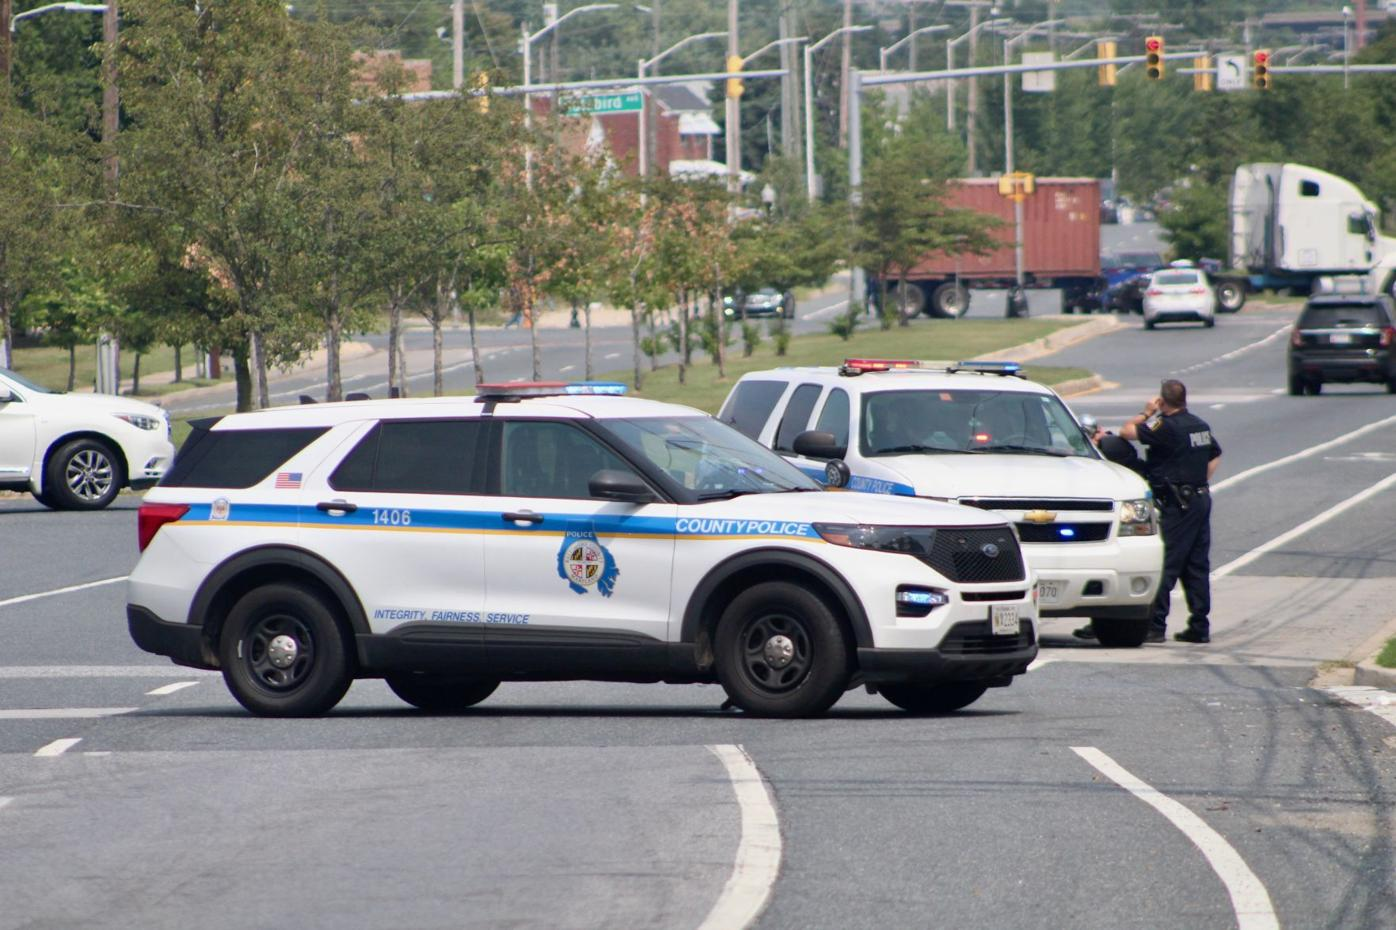 Two injured in Dundalk Avenue crash